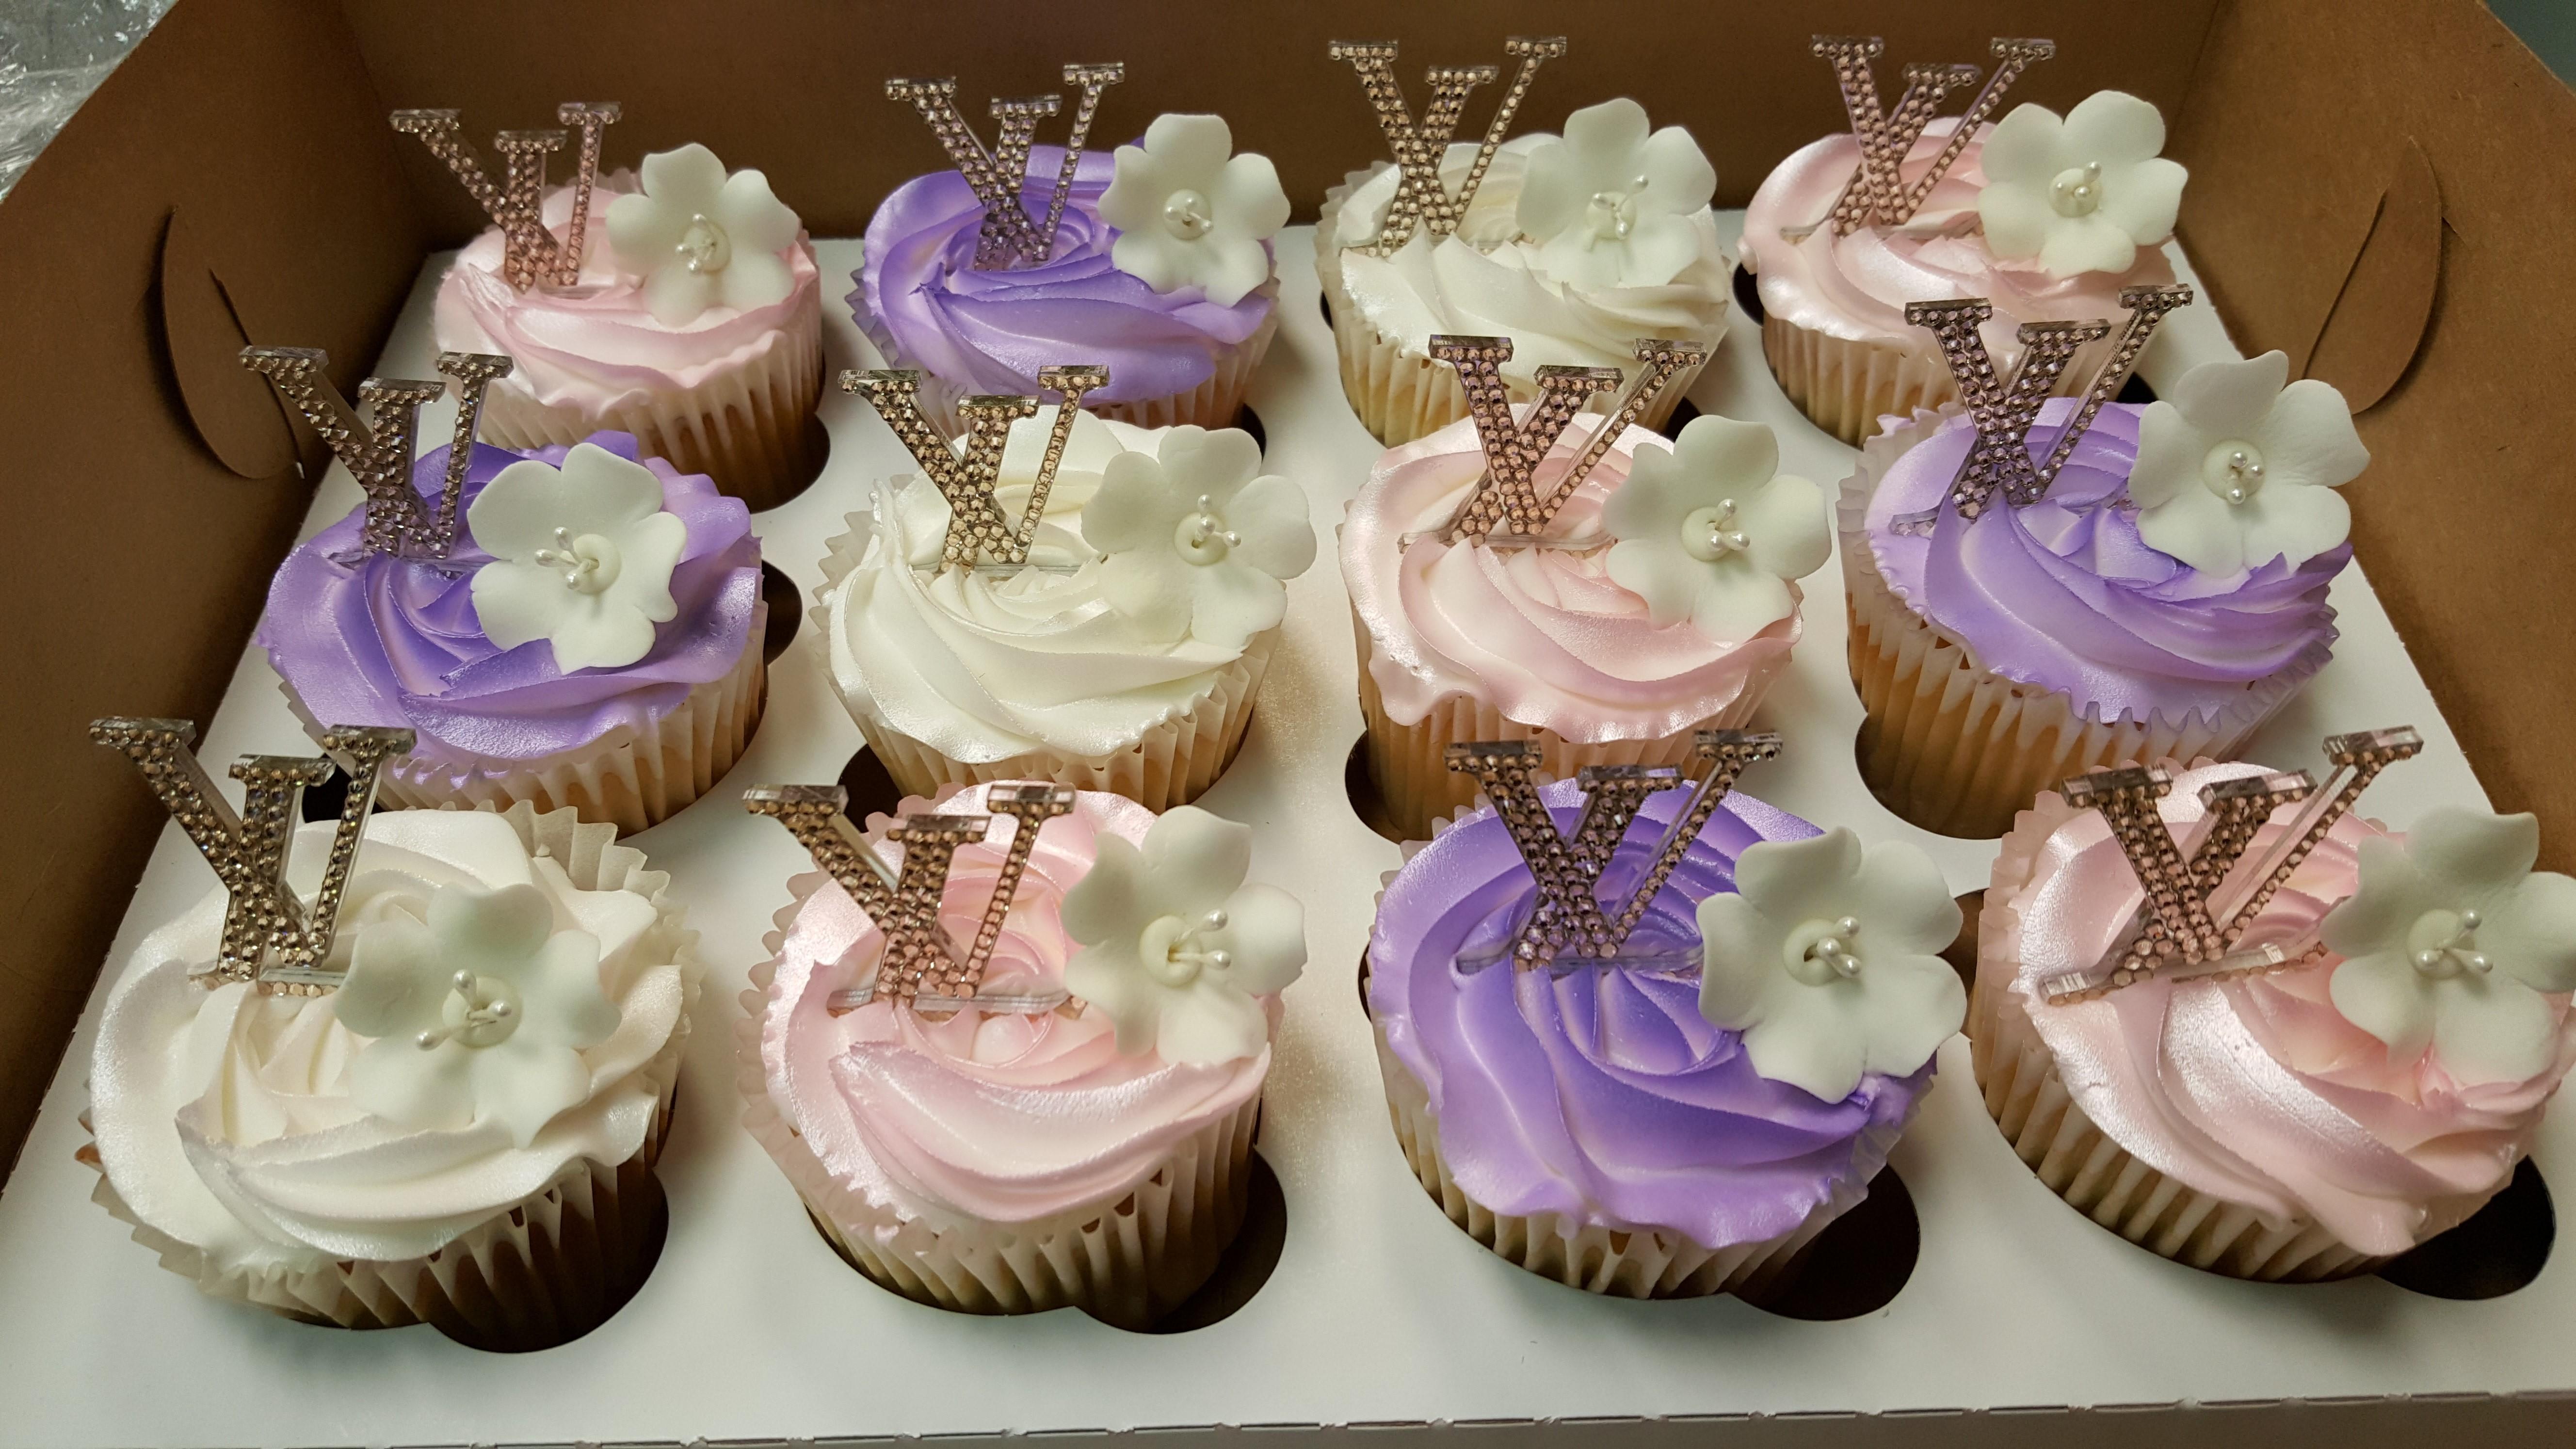 Wedding Cakes by Tammy Allen image 27